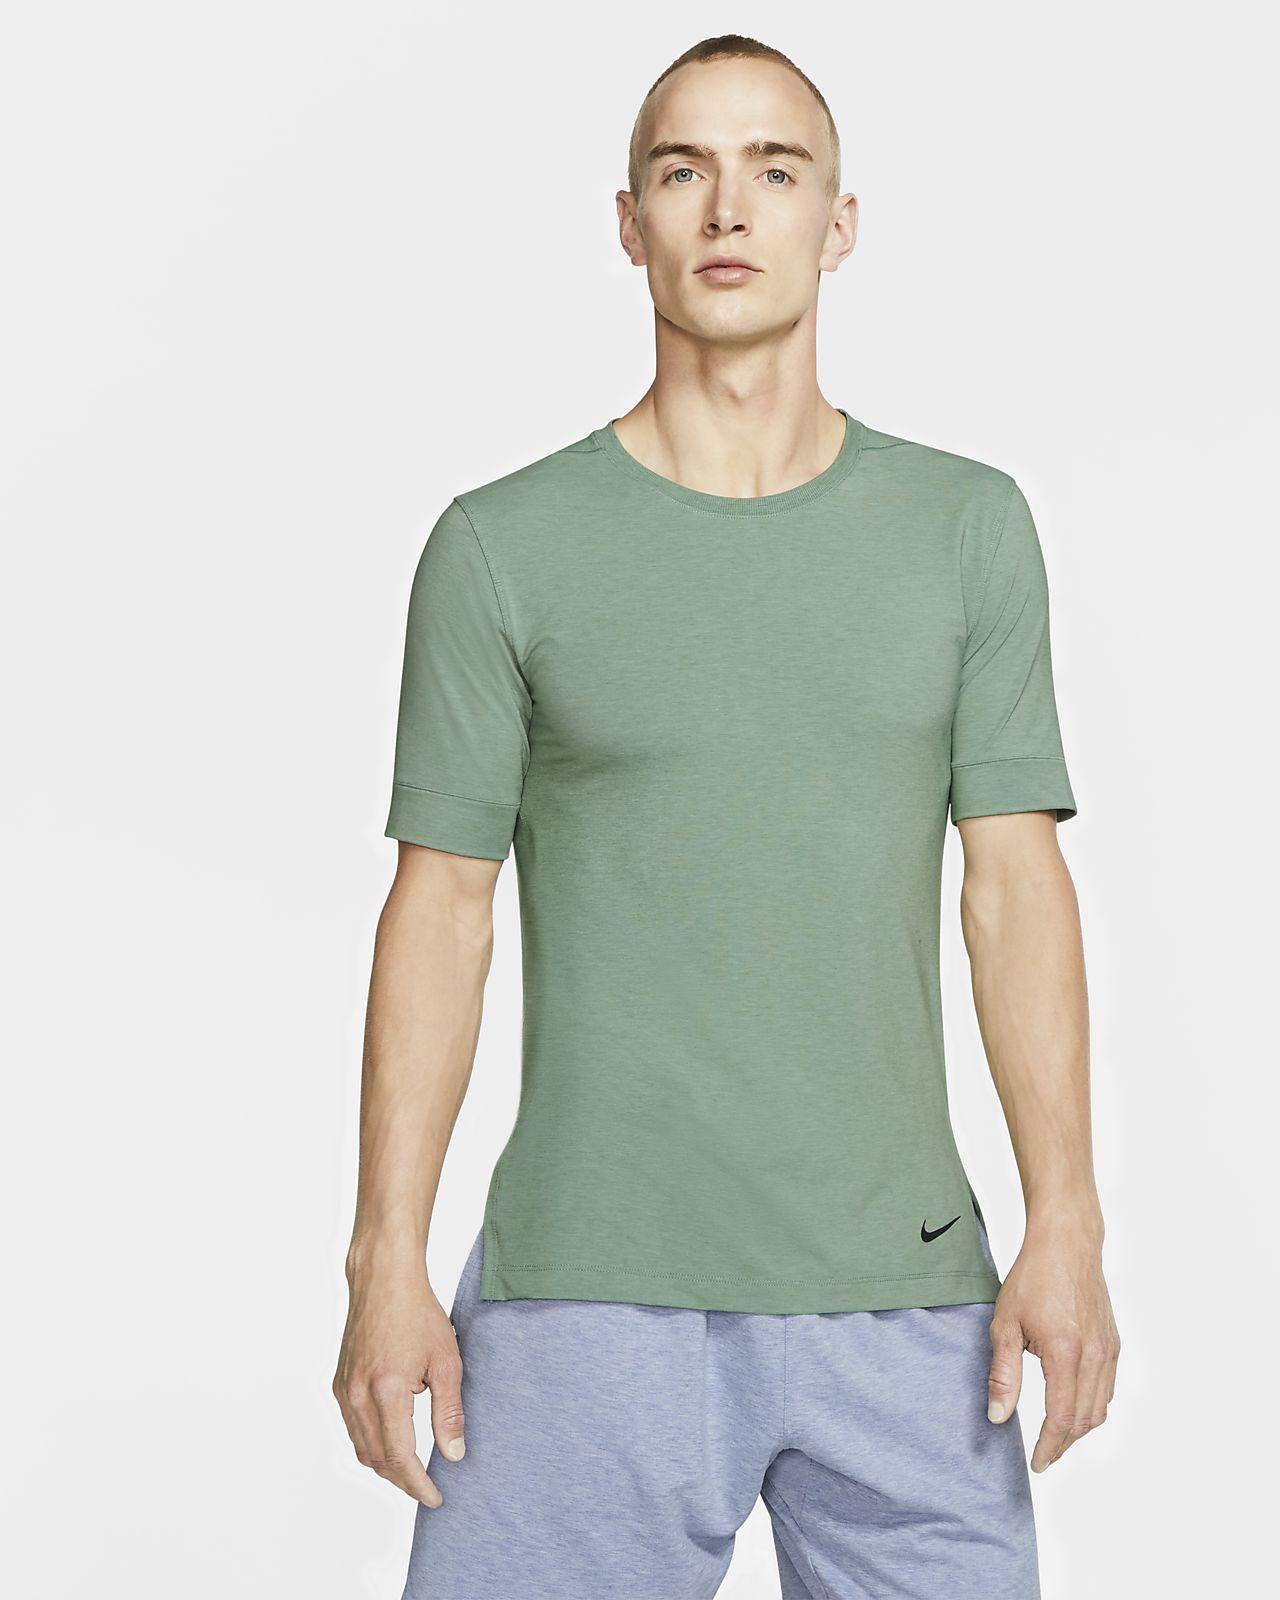 Nike Dri-FIT Kurzarm-Yoga-Trainingsoberteil für Herren